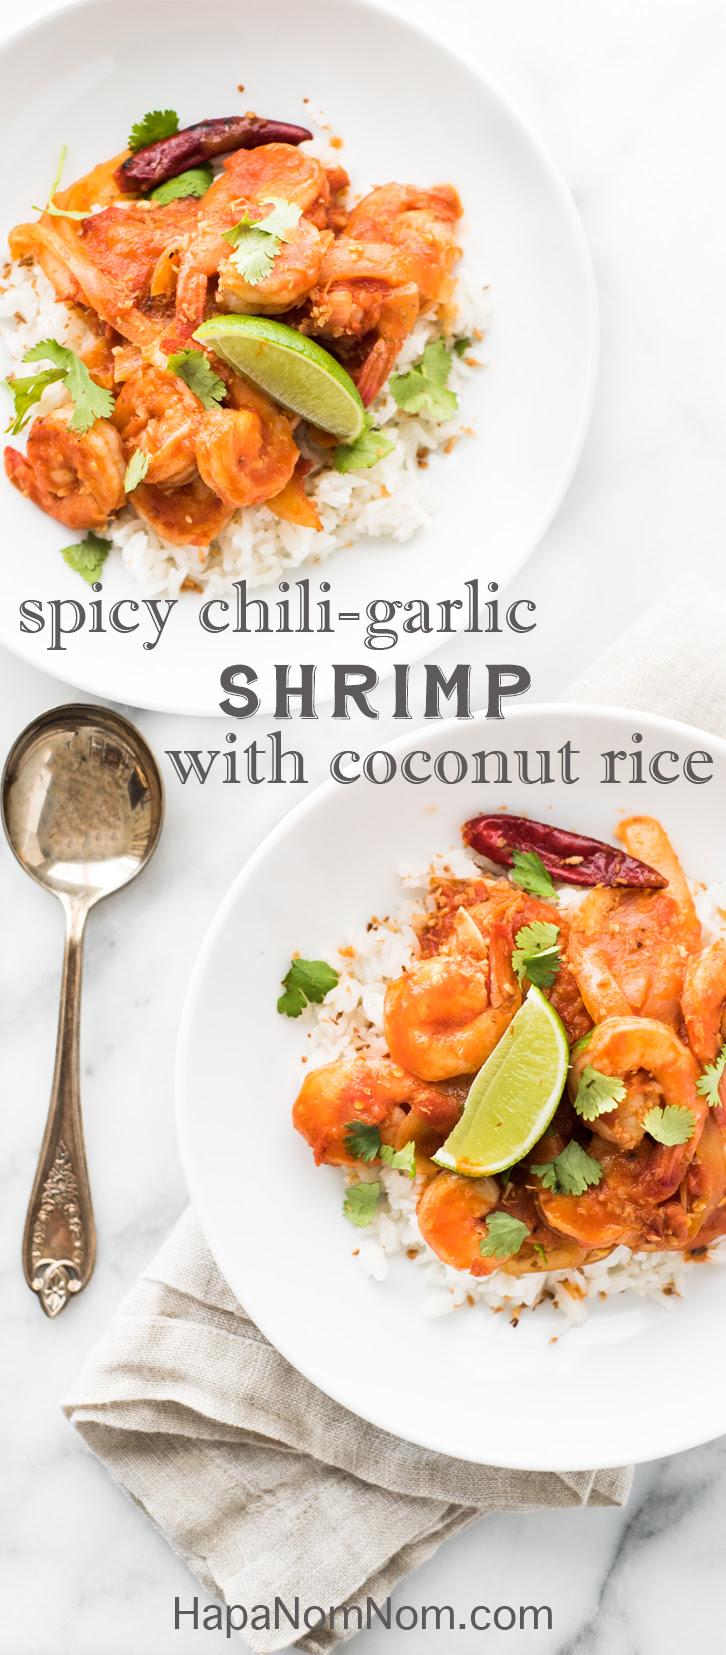 Spicy Chili Garlic Shrimp with Coconut Rice